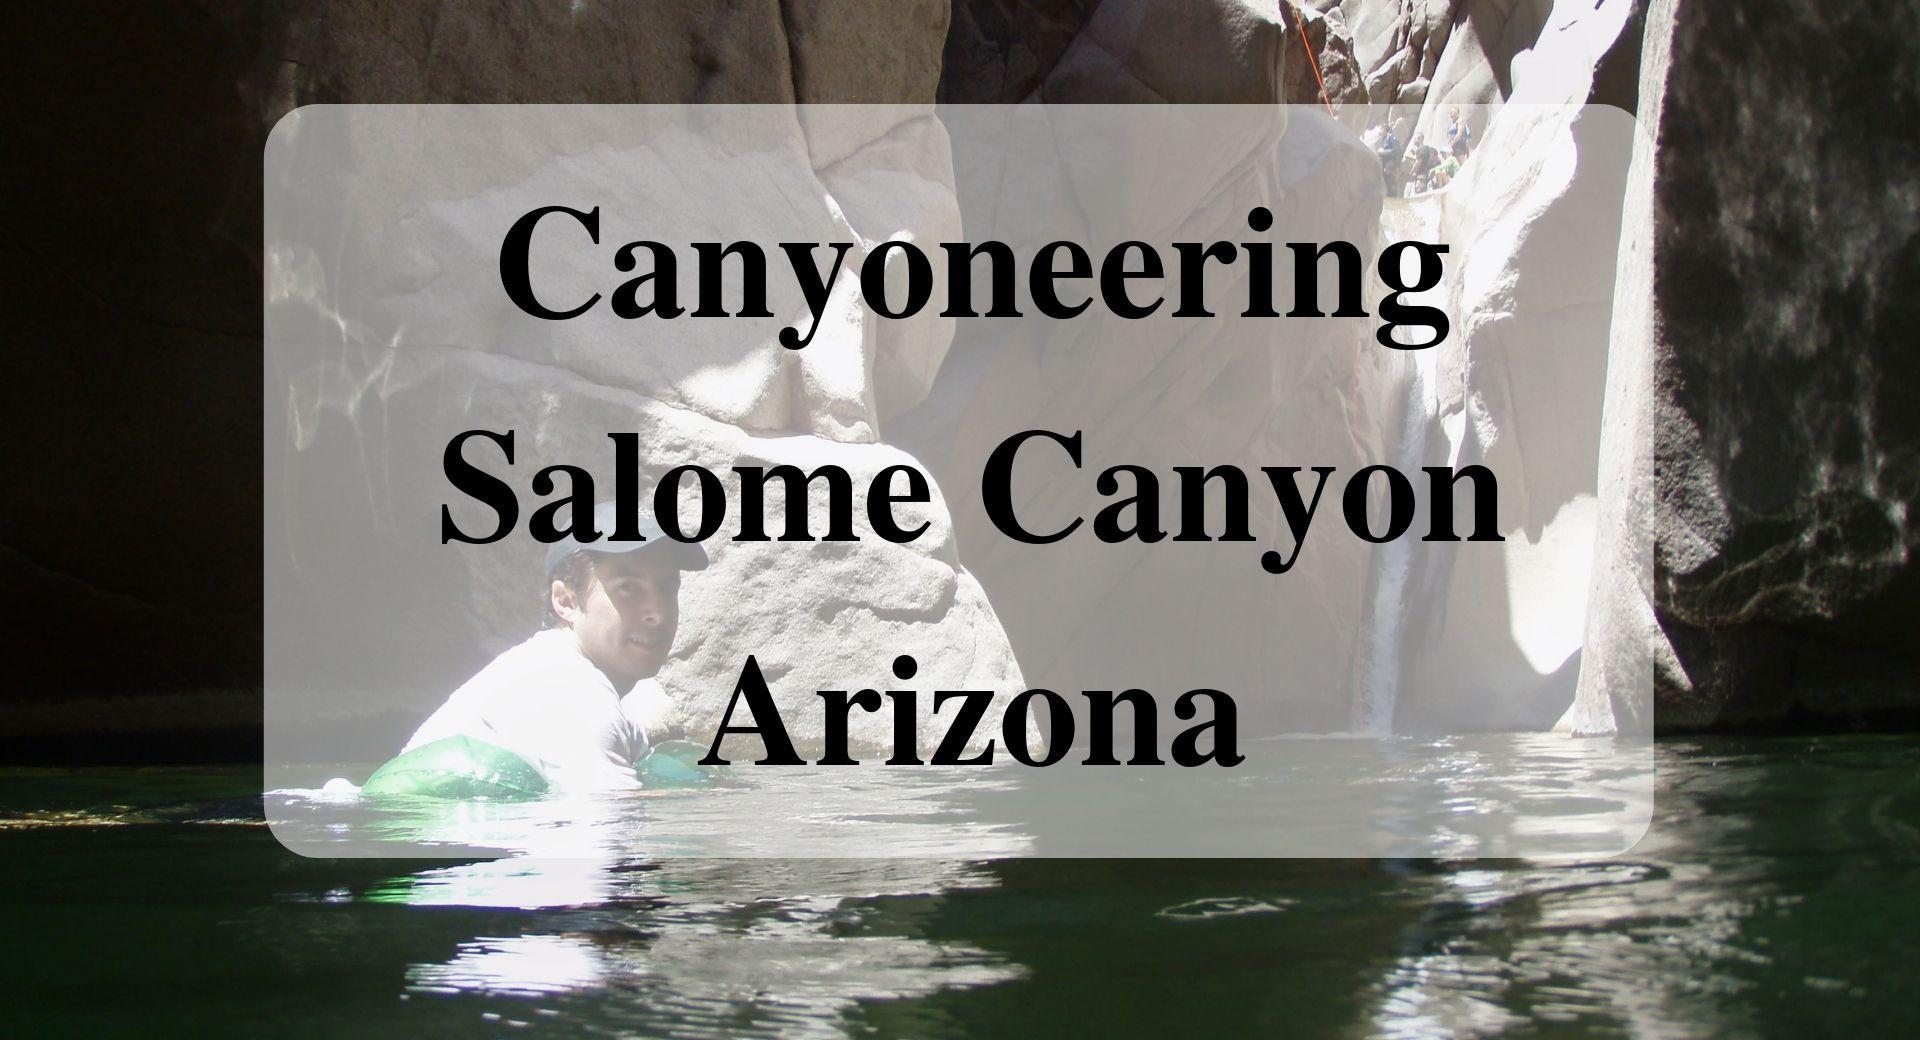 Main Canyoneering Salome Canyon Arizona